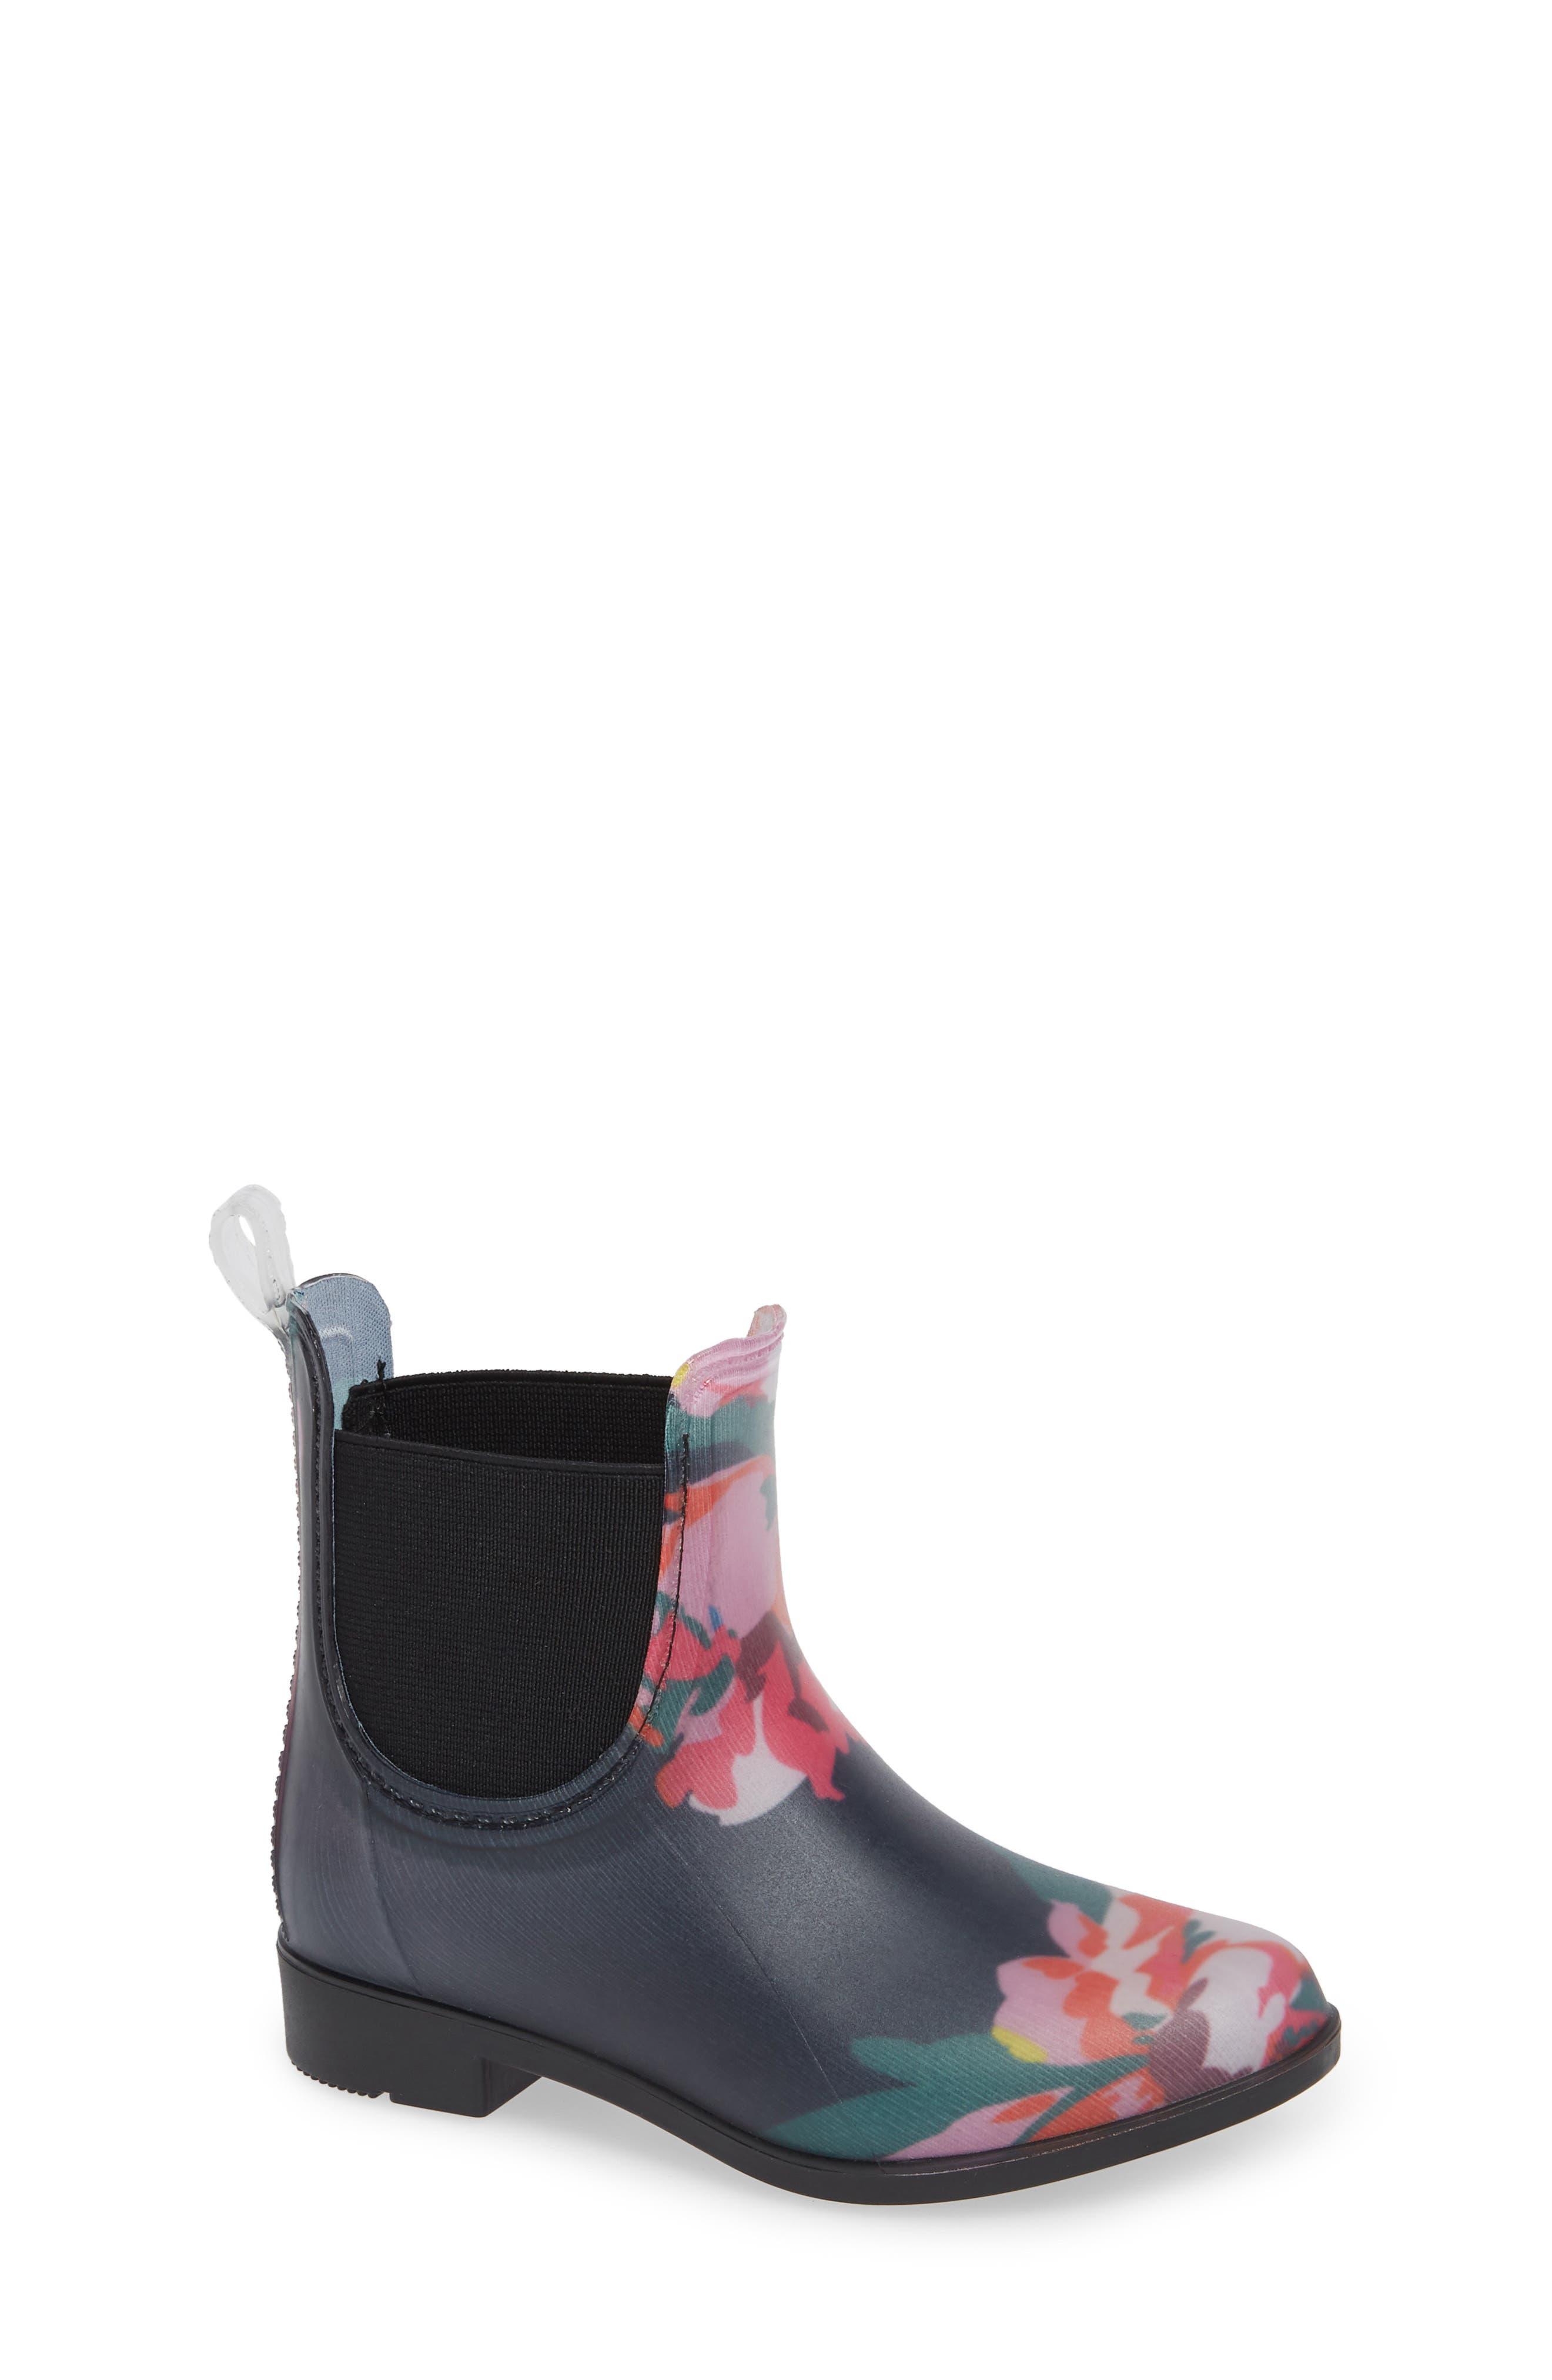 Chelsea Rain Boot,                             Main thumbnail 1, color,                             NAVY GRANNY FLORAL